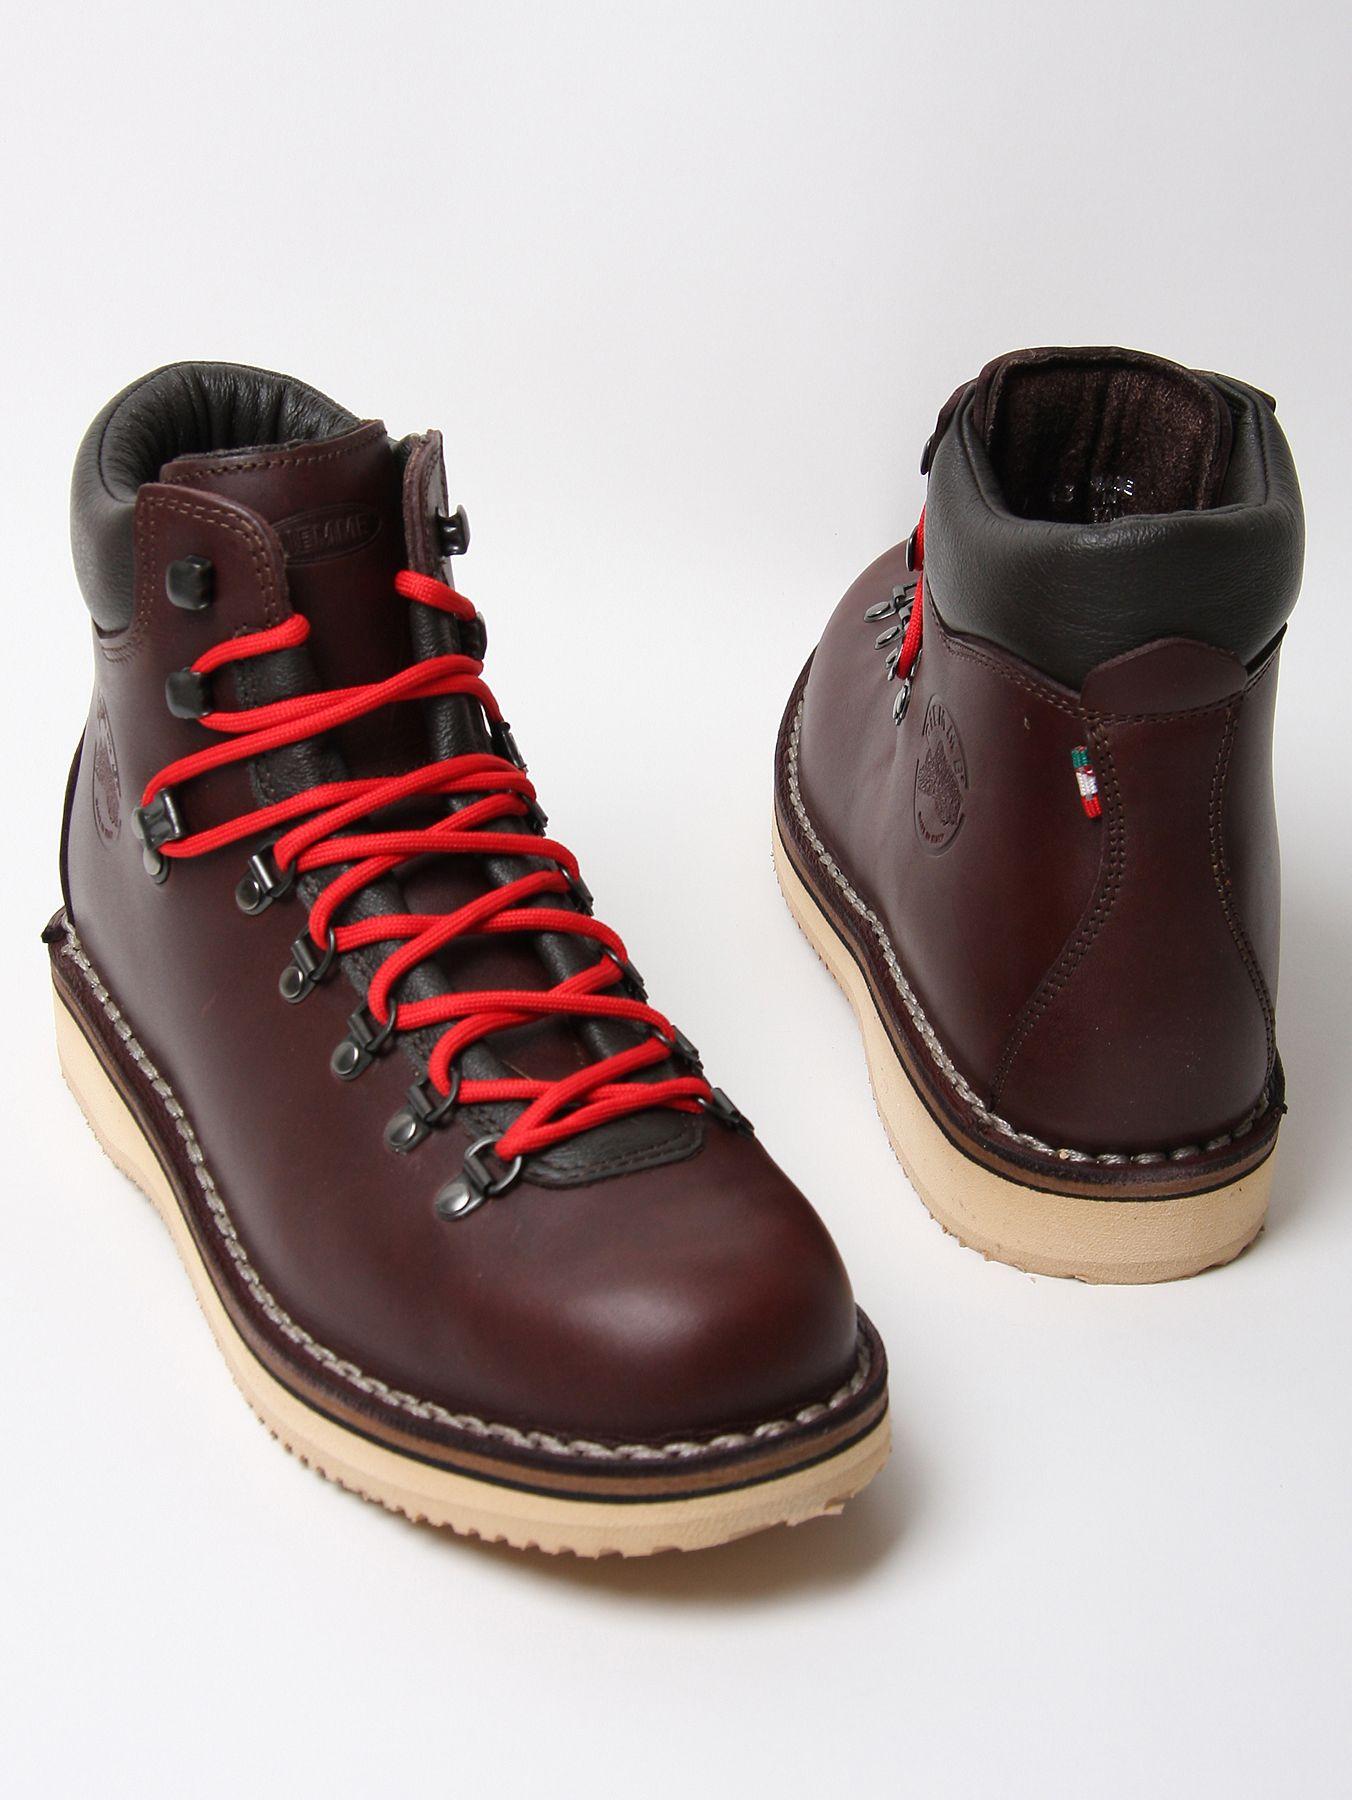 Diemme Full Grain Leather Vibram Sole Boot In Brown For